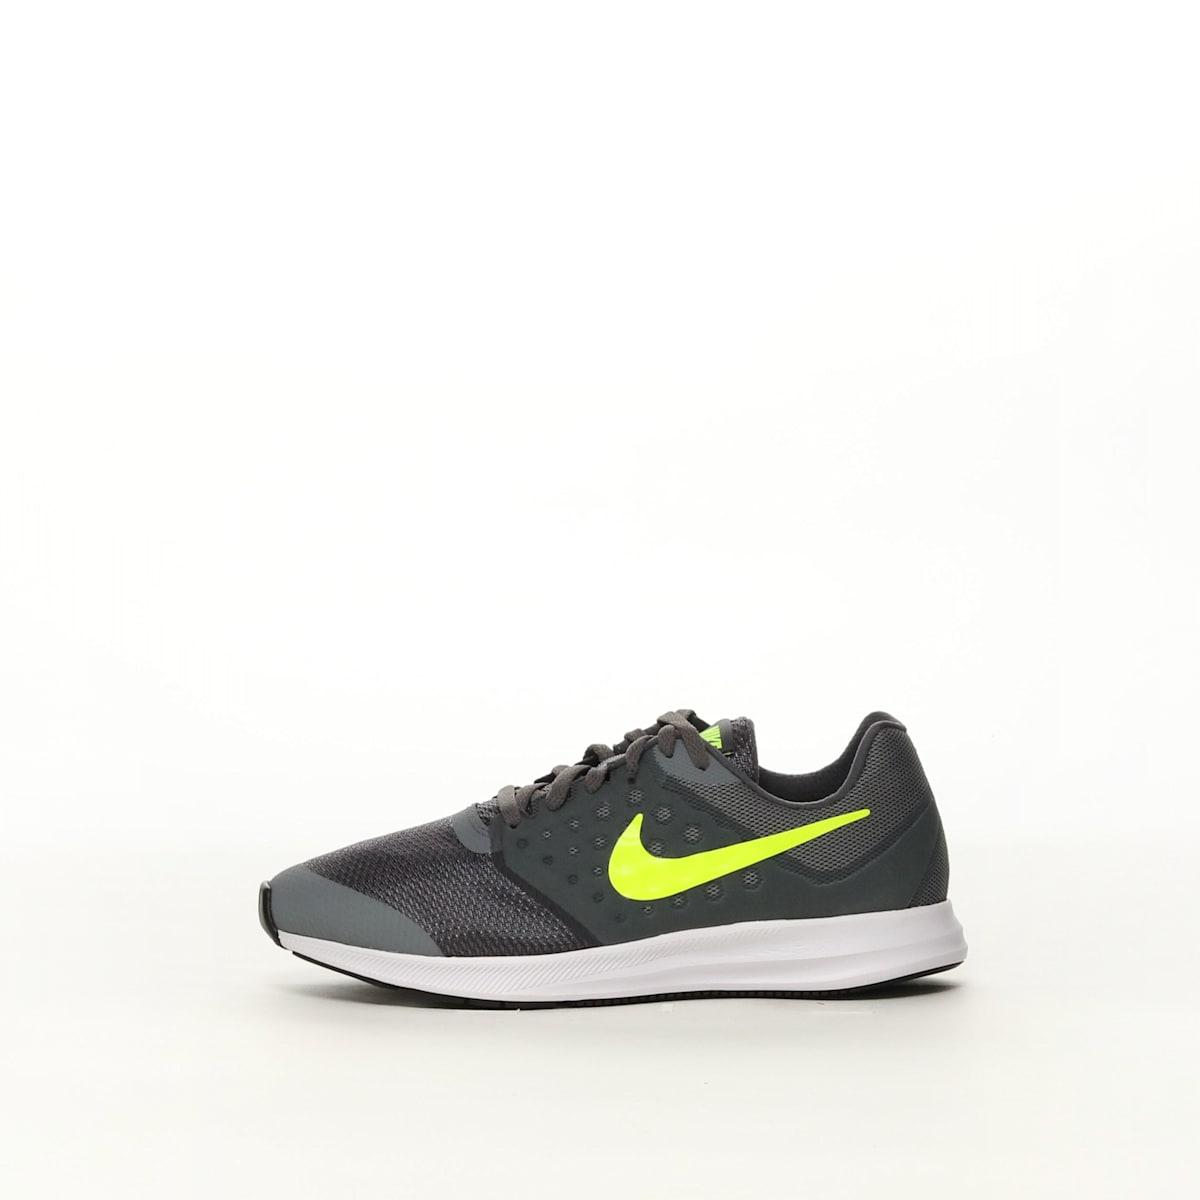 74fd5674fa610 Boys  Nike Downshifter 7 Wide (GS) Running Shoe - COL GY VOLT – Resku